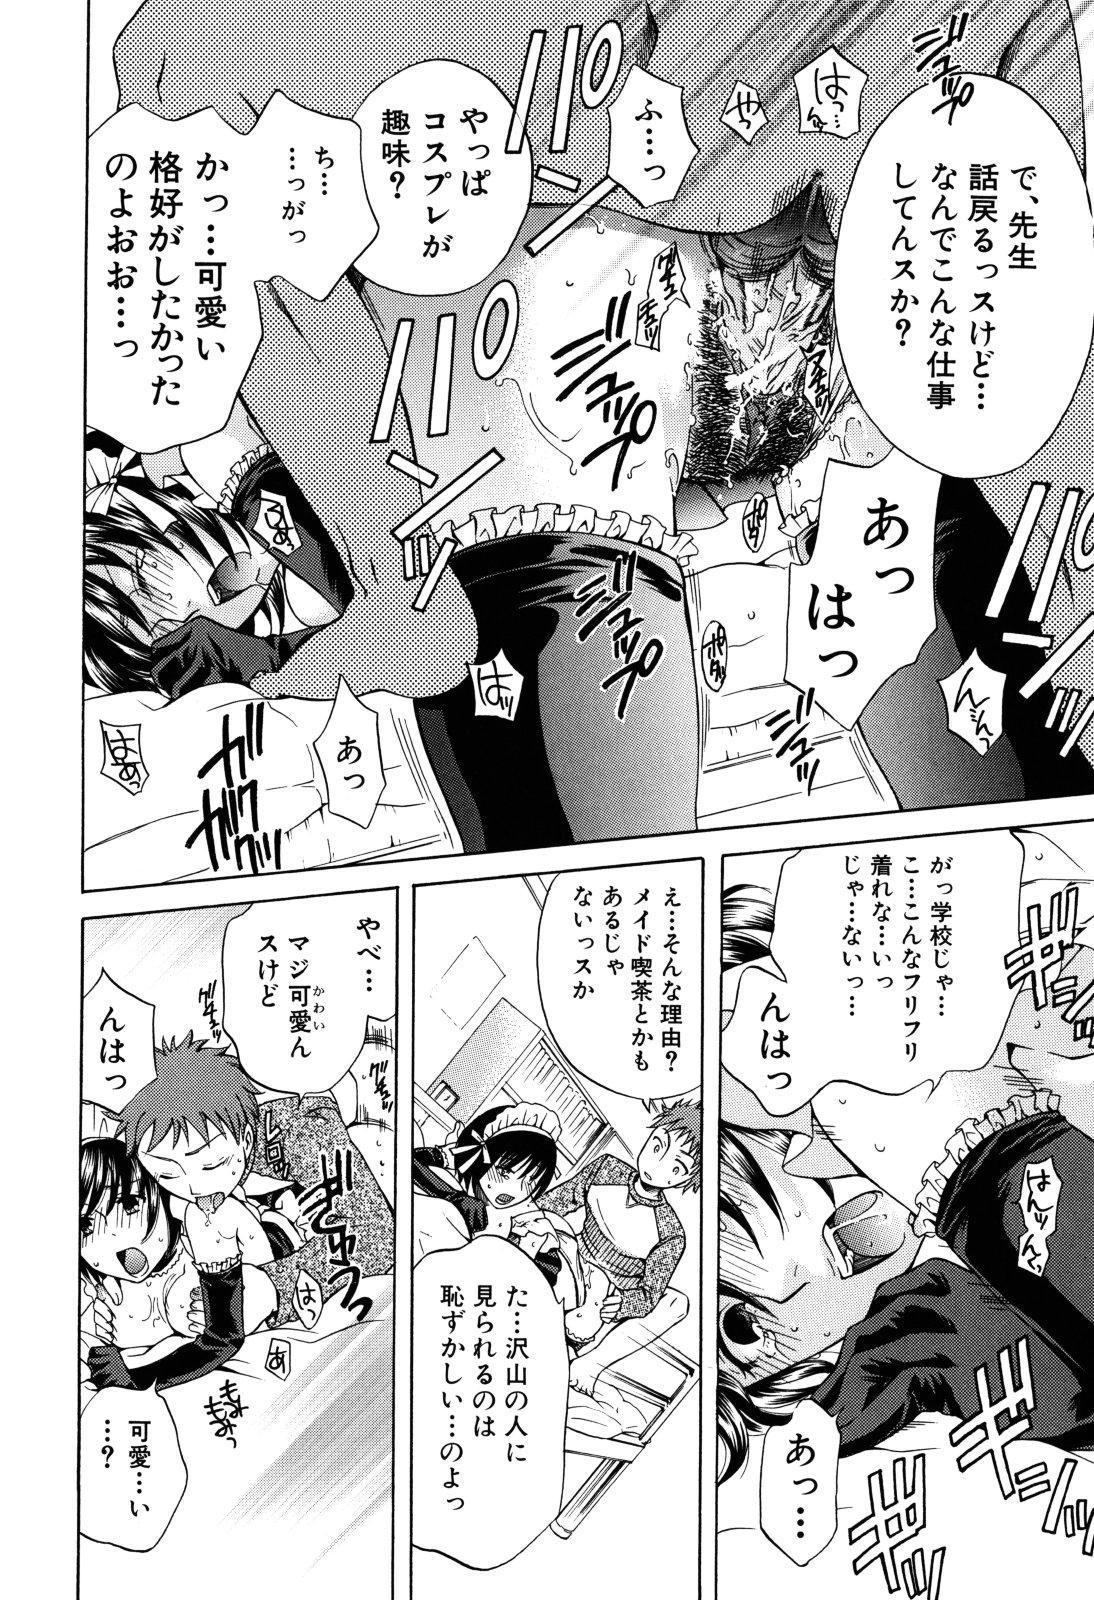 Kanojo ga Ochiru made - She in the depth 113